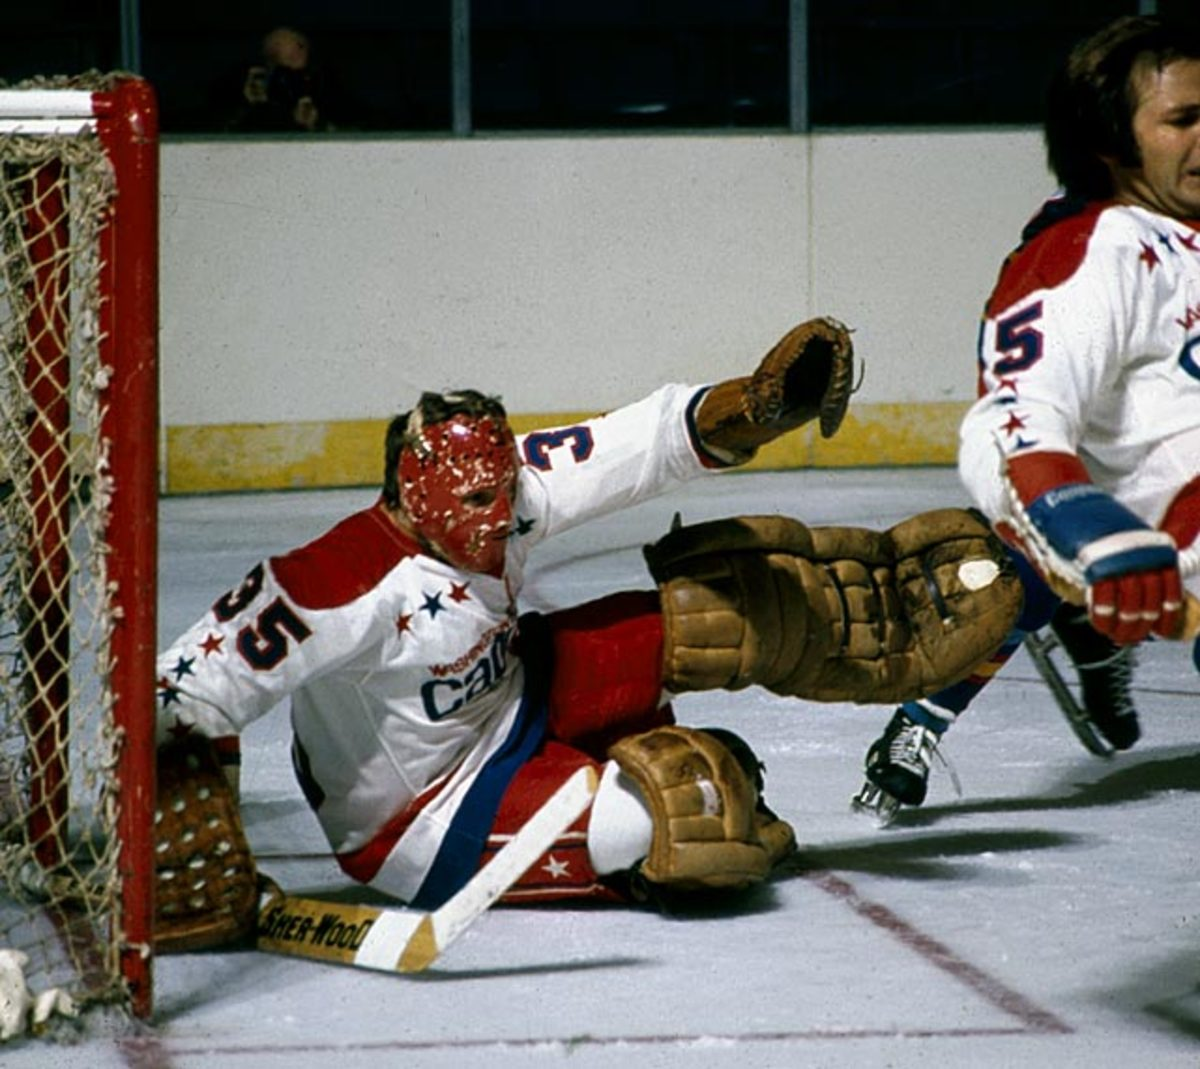 1974-75 Washington Capitals